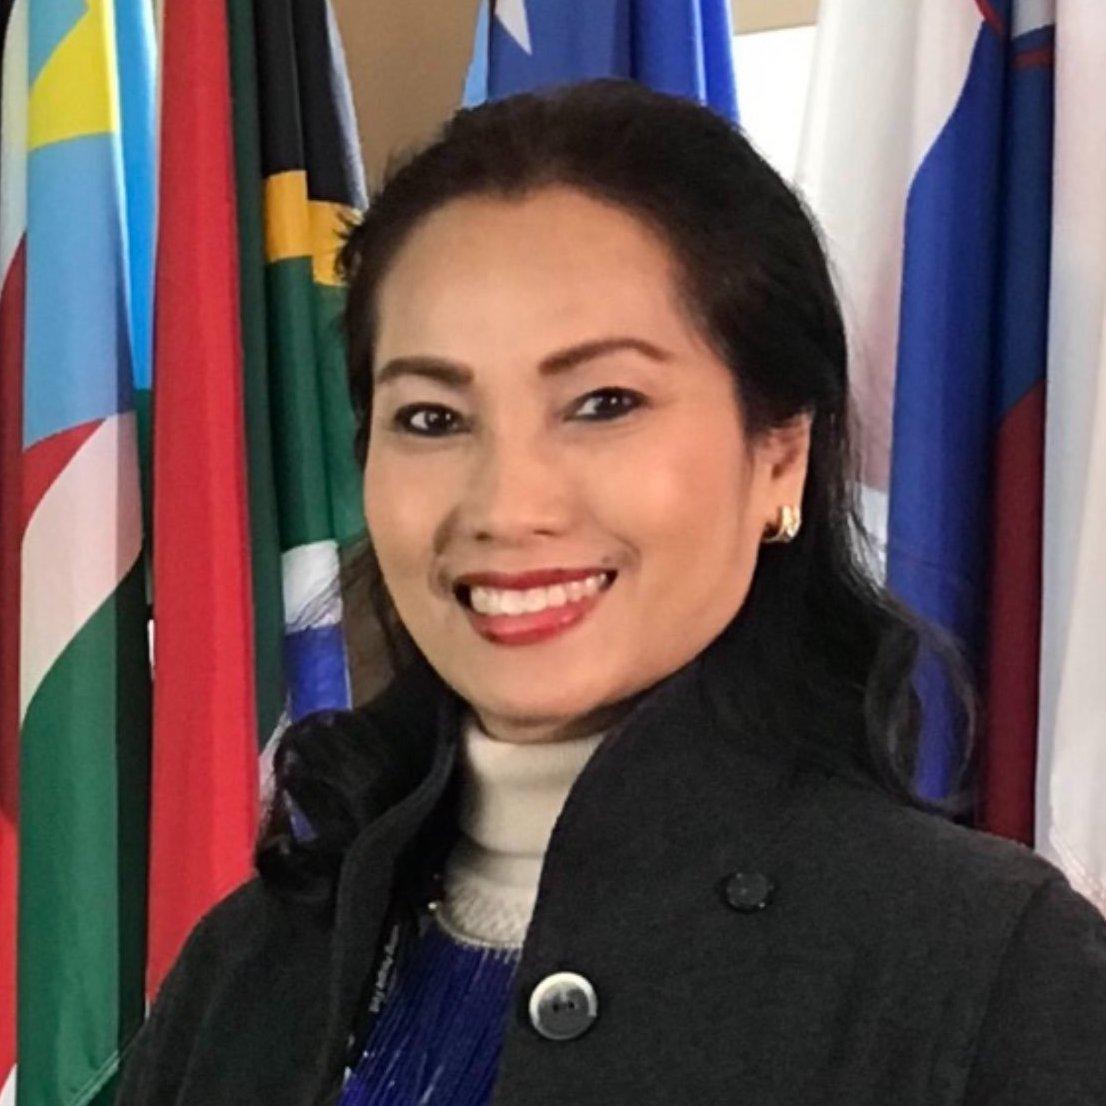 Chularat Israngkool Na Ayutthaya, Thailand - 1st Vice President UN 2021-2024